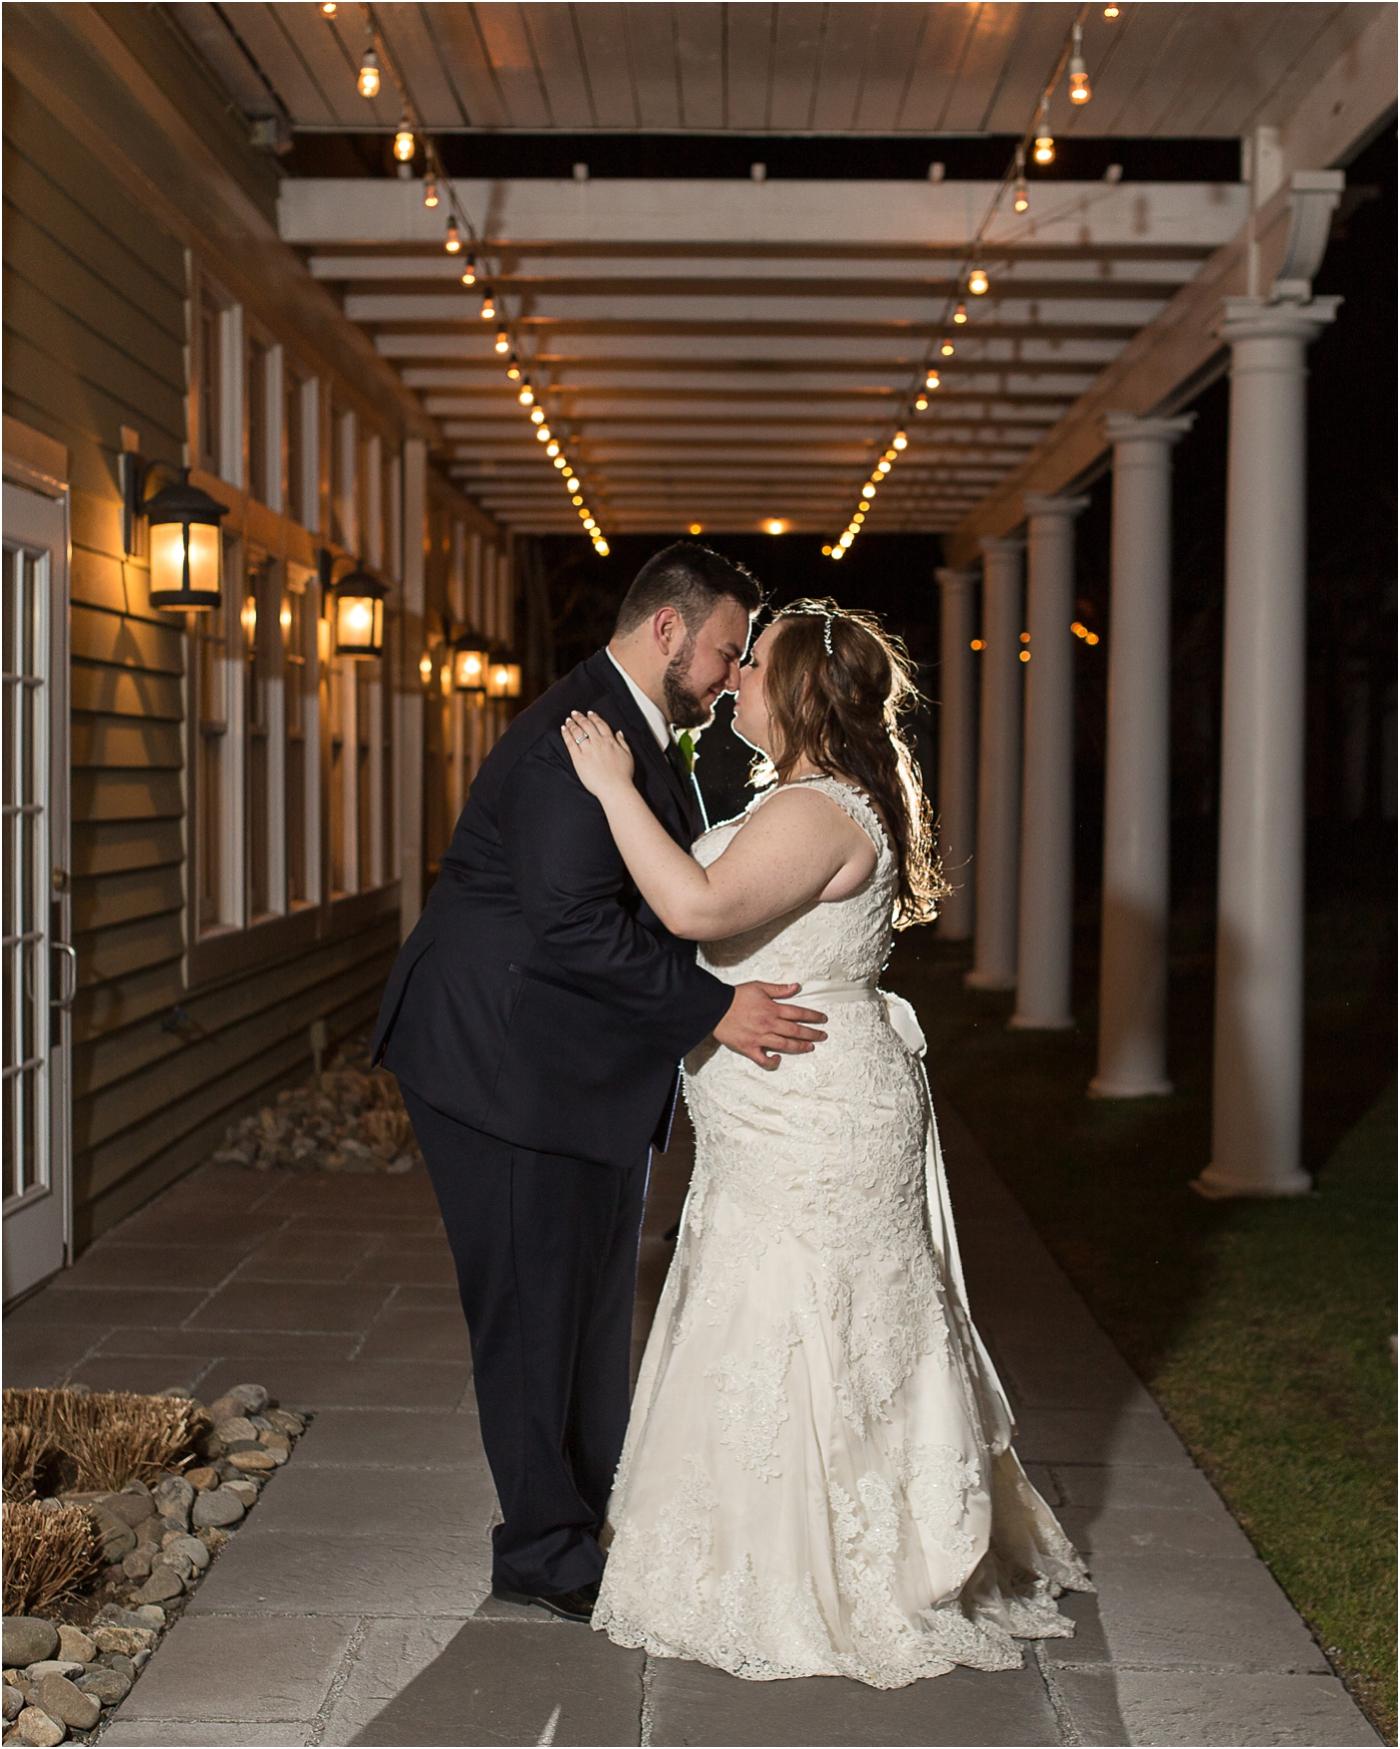 Chesapeake-Bay-Beach-Club-Wedding-95.jpg